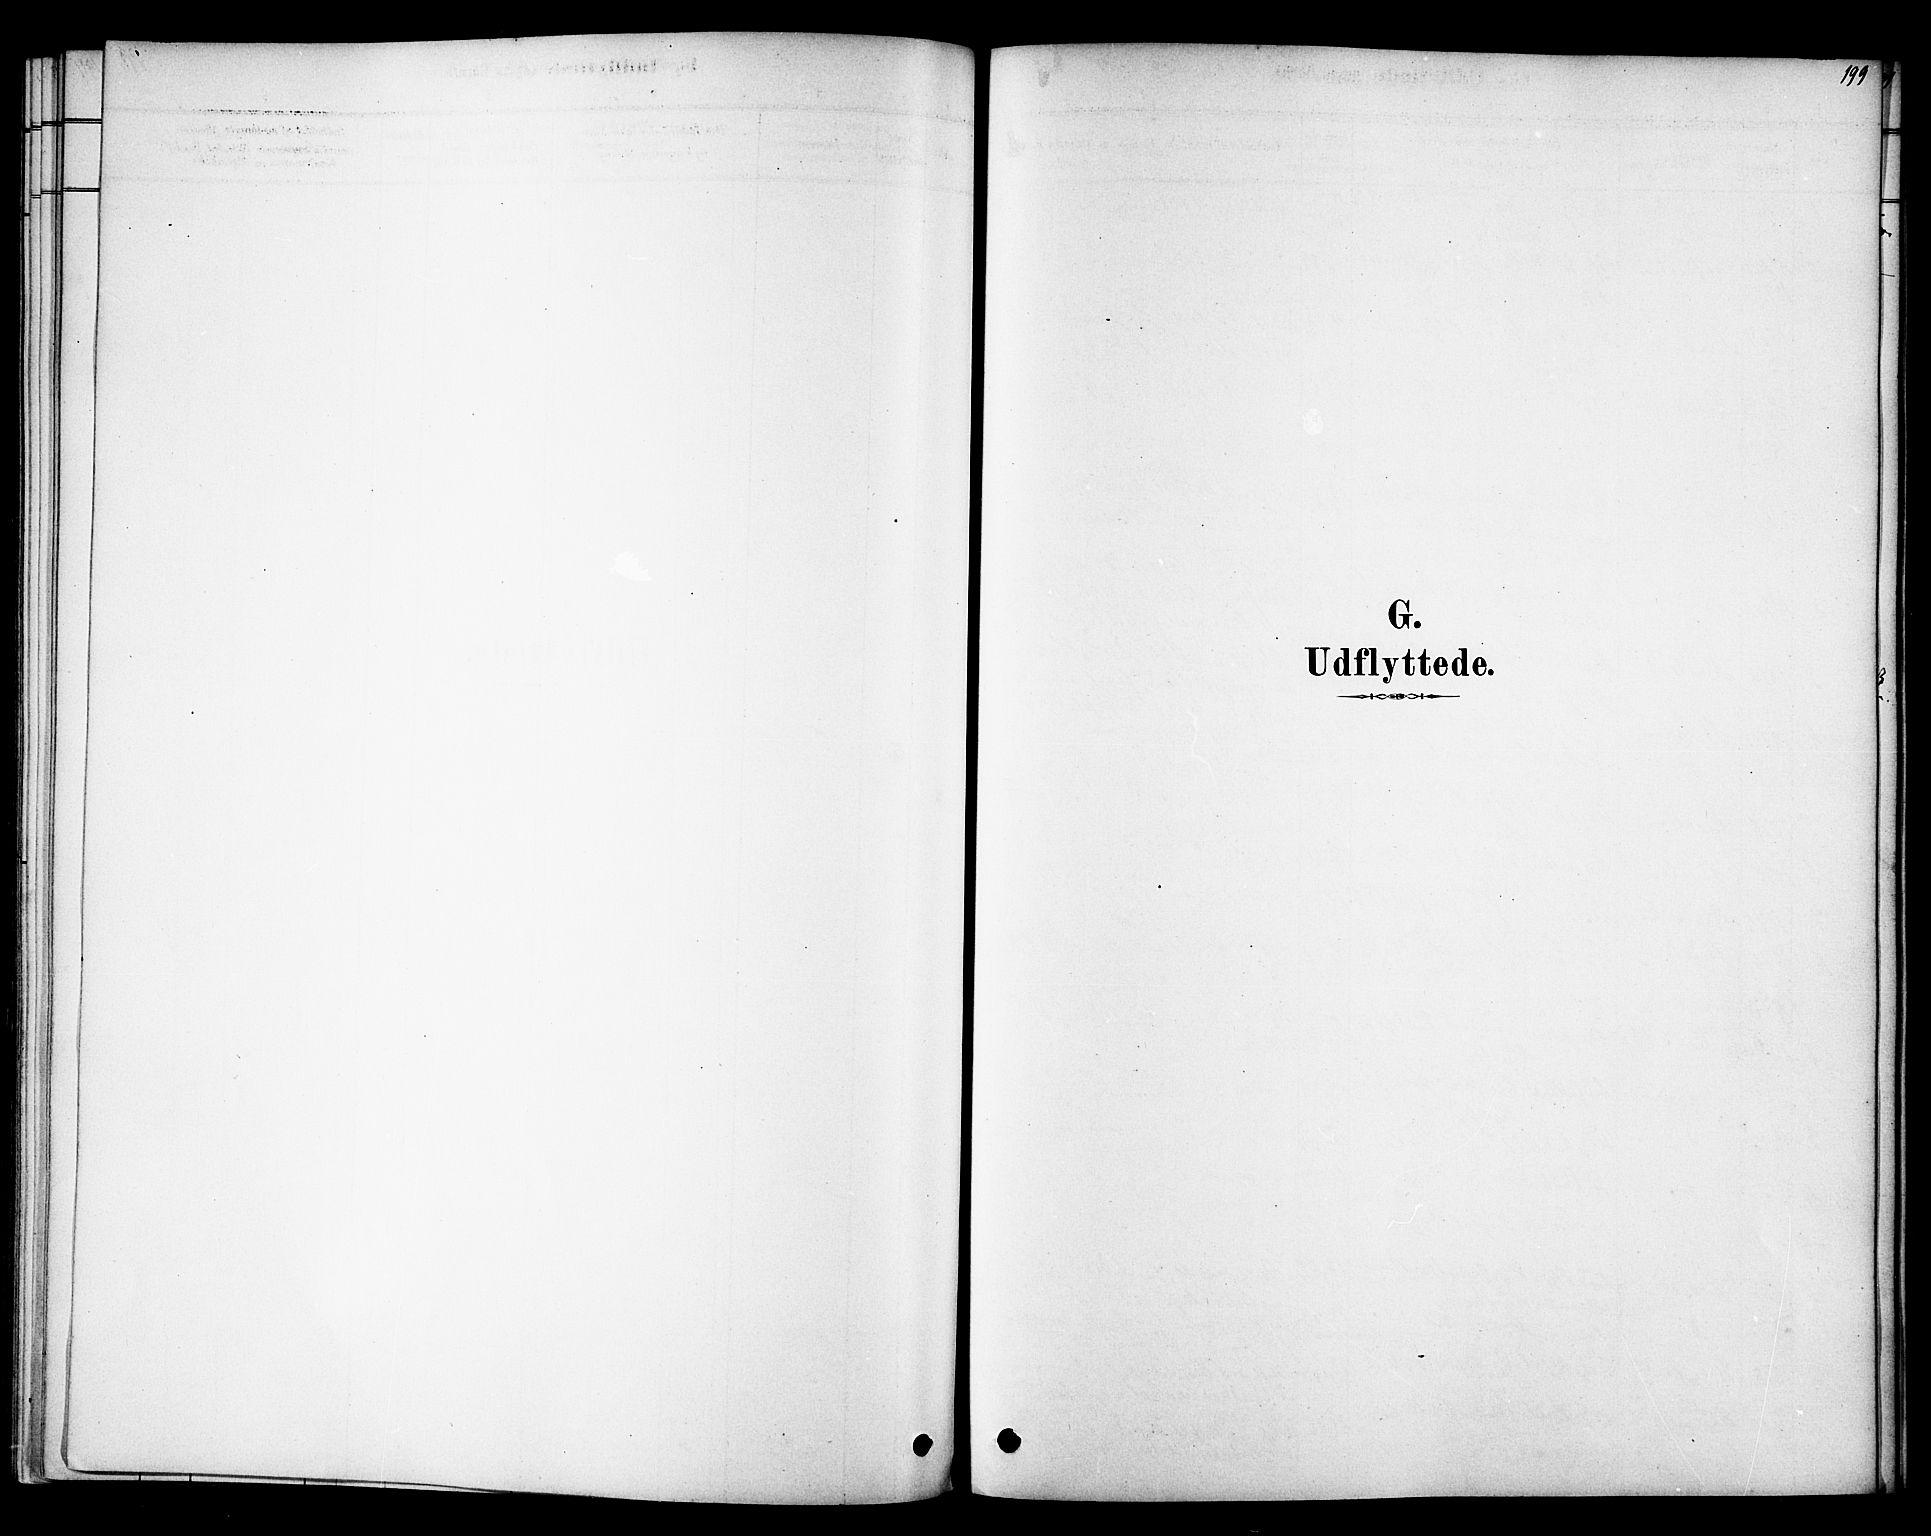 SAT, Ministerialprotokoller, klokkerbøker og fødselsregistre - Sør-Trøndelag, 692/L1105: Parish register (official) no. 692A05, 1878-1890, p. 199